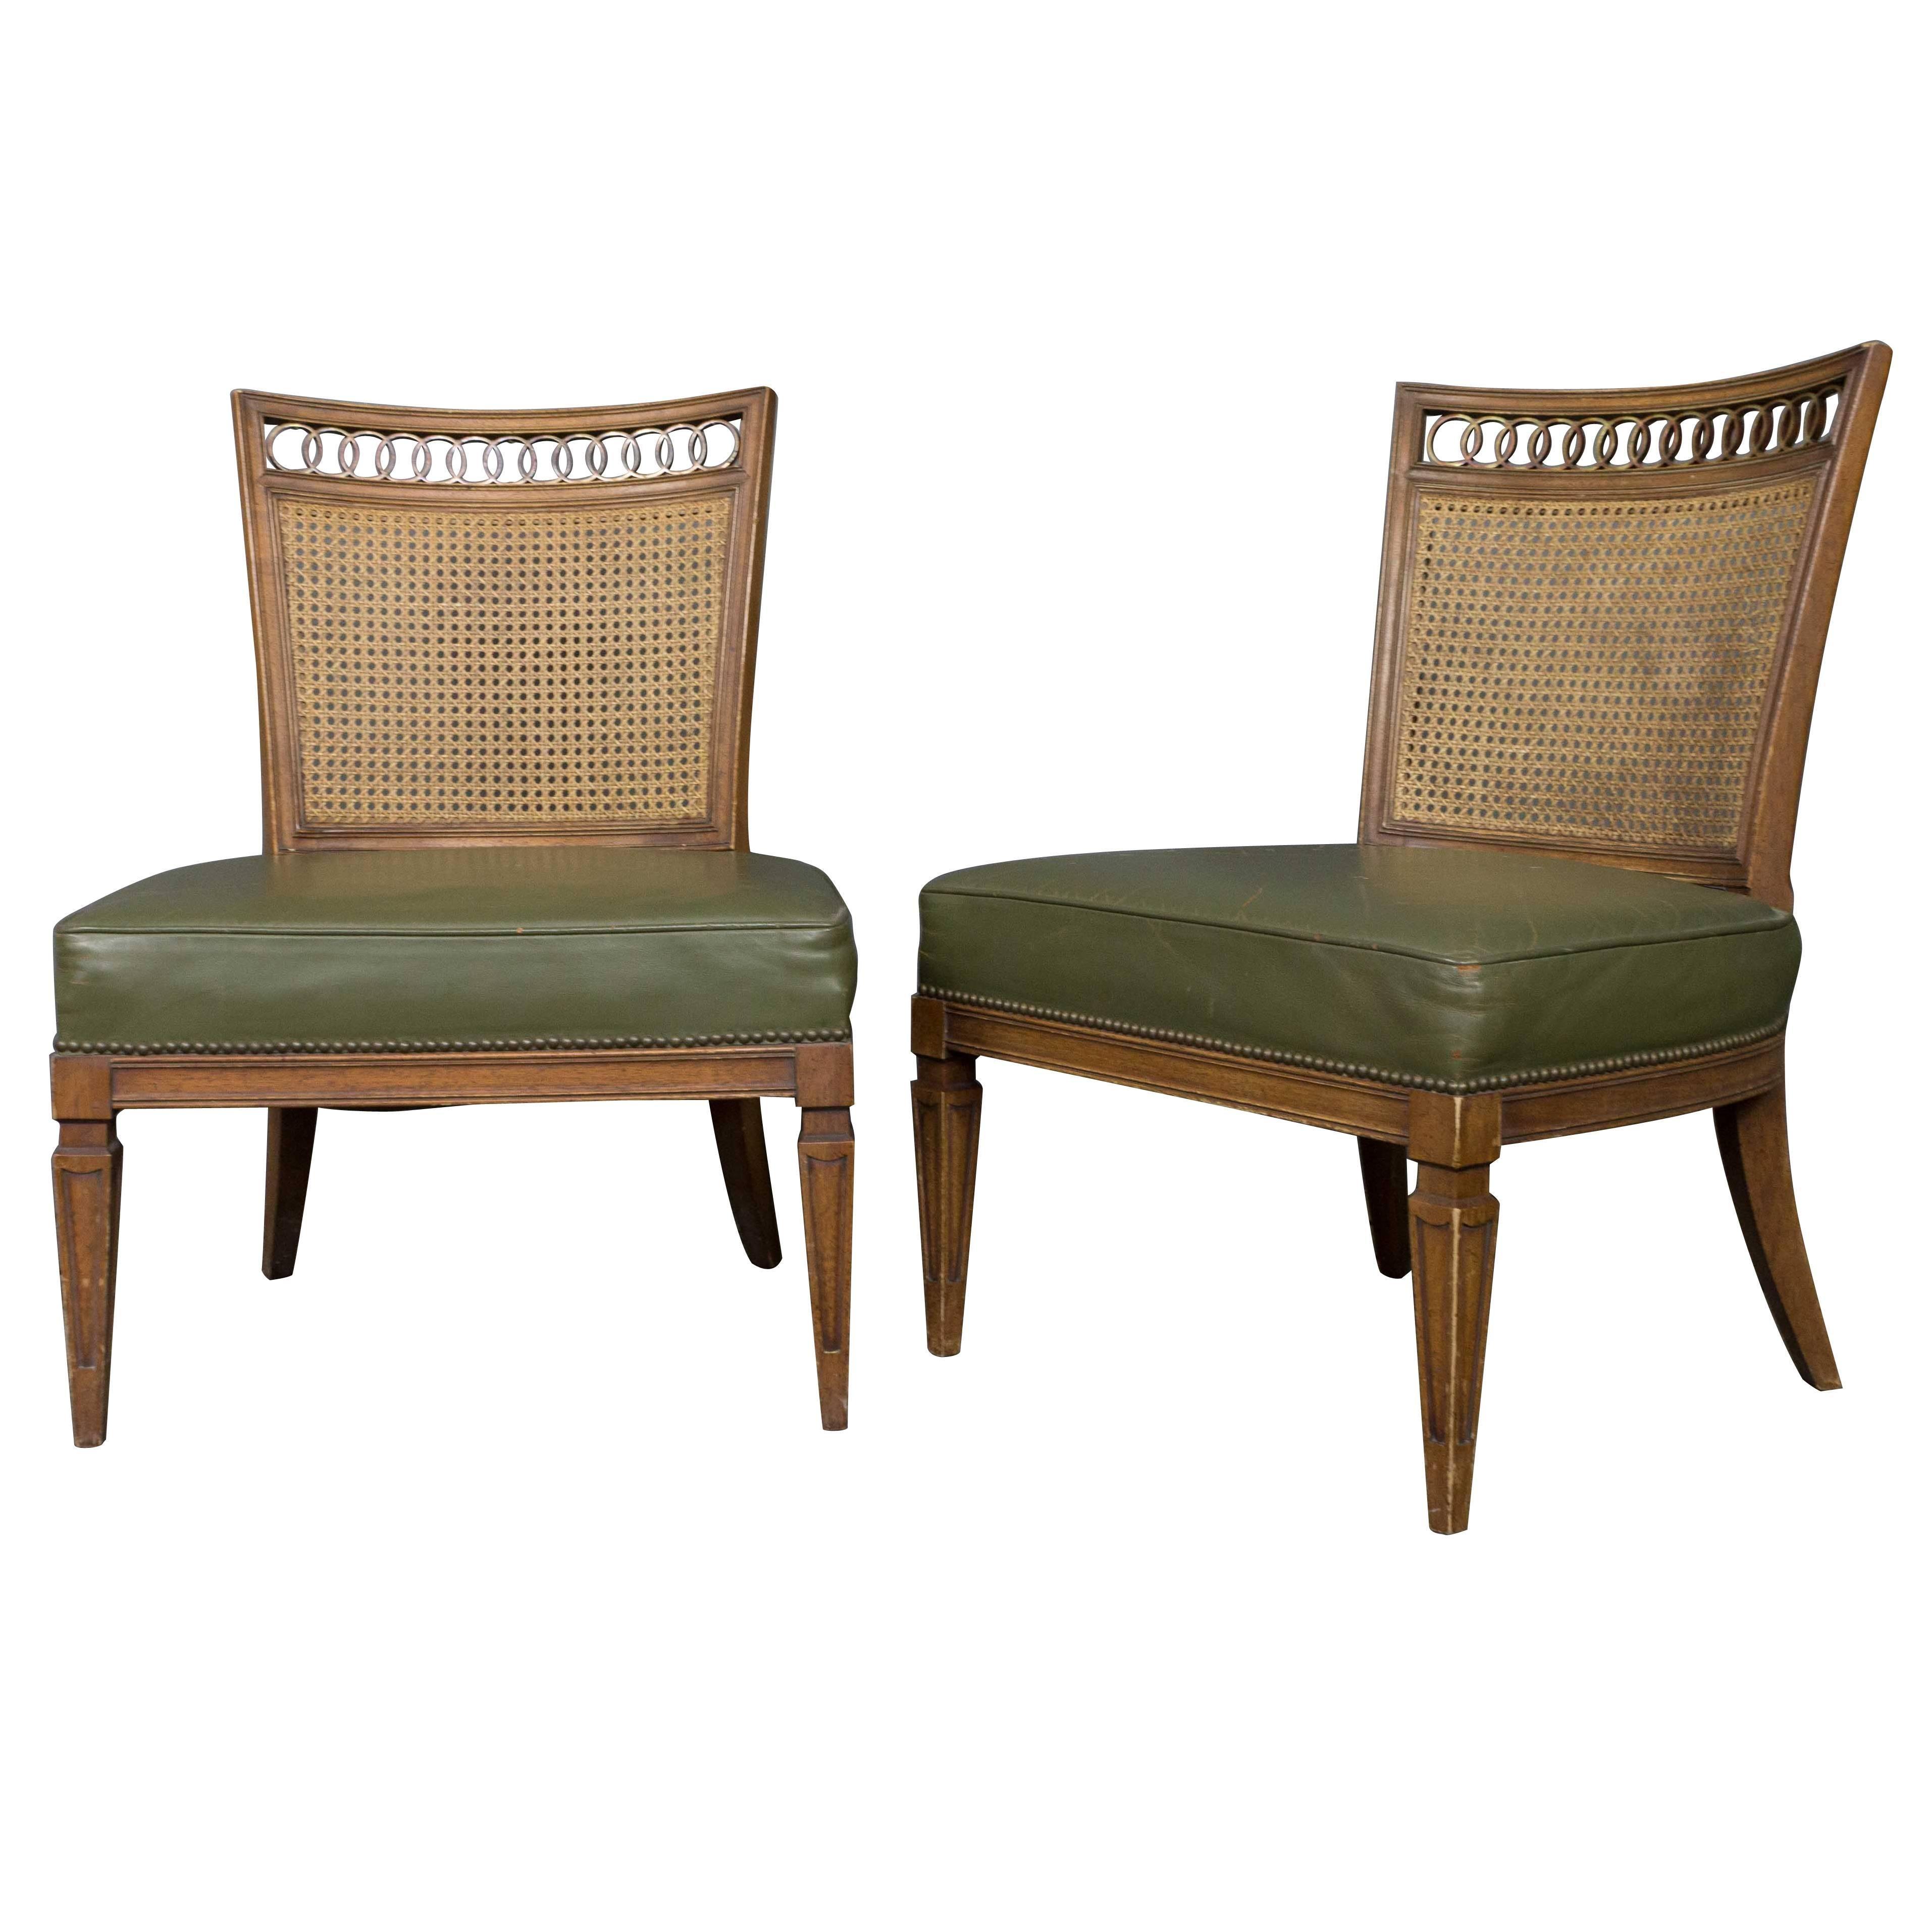 Pair of Italian Mid-Century Modern Side Chairs